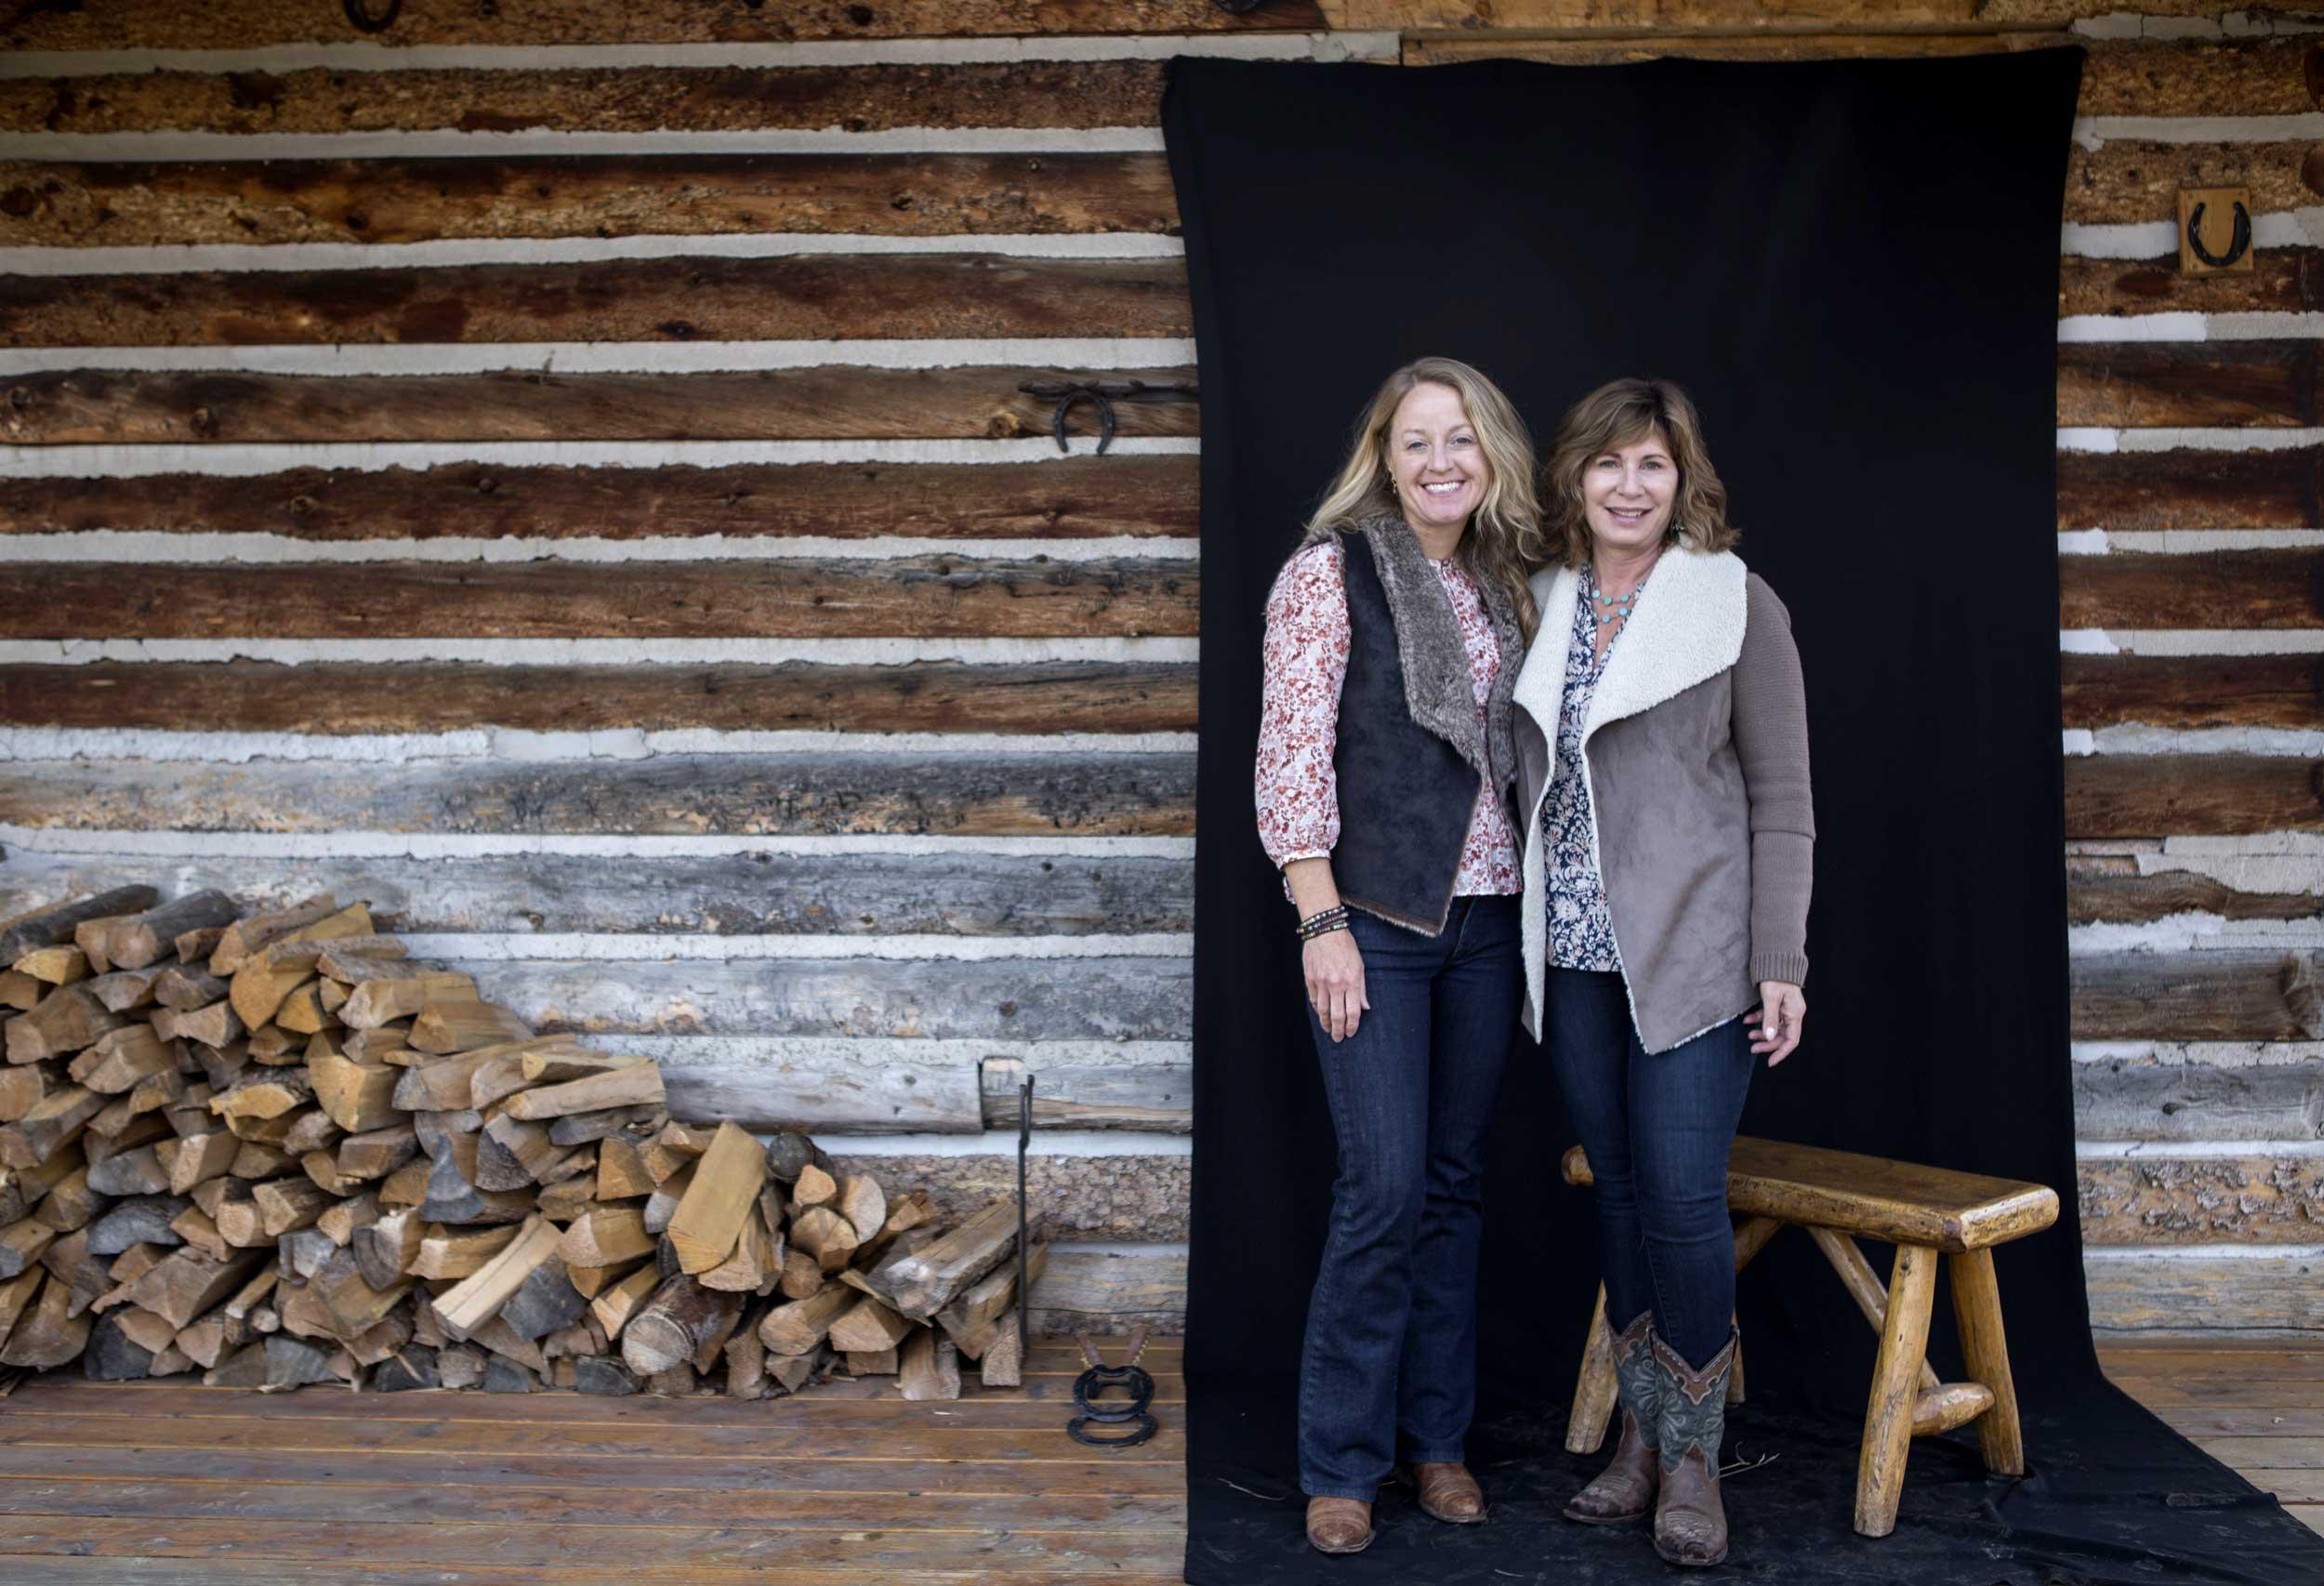 Laura Riordan and Linda Lesem Dare to Detour